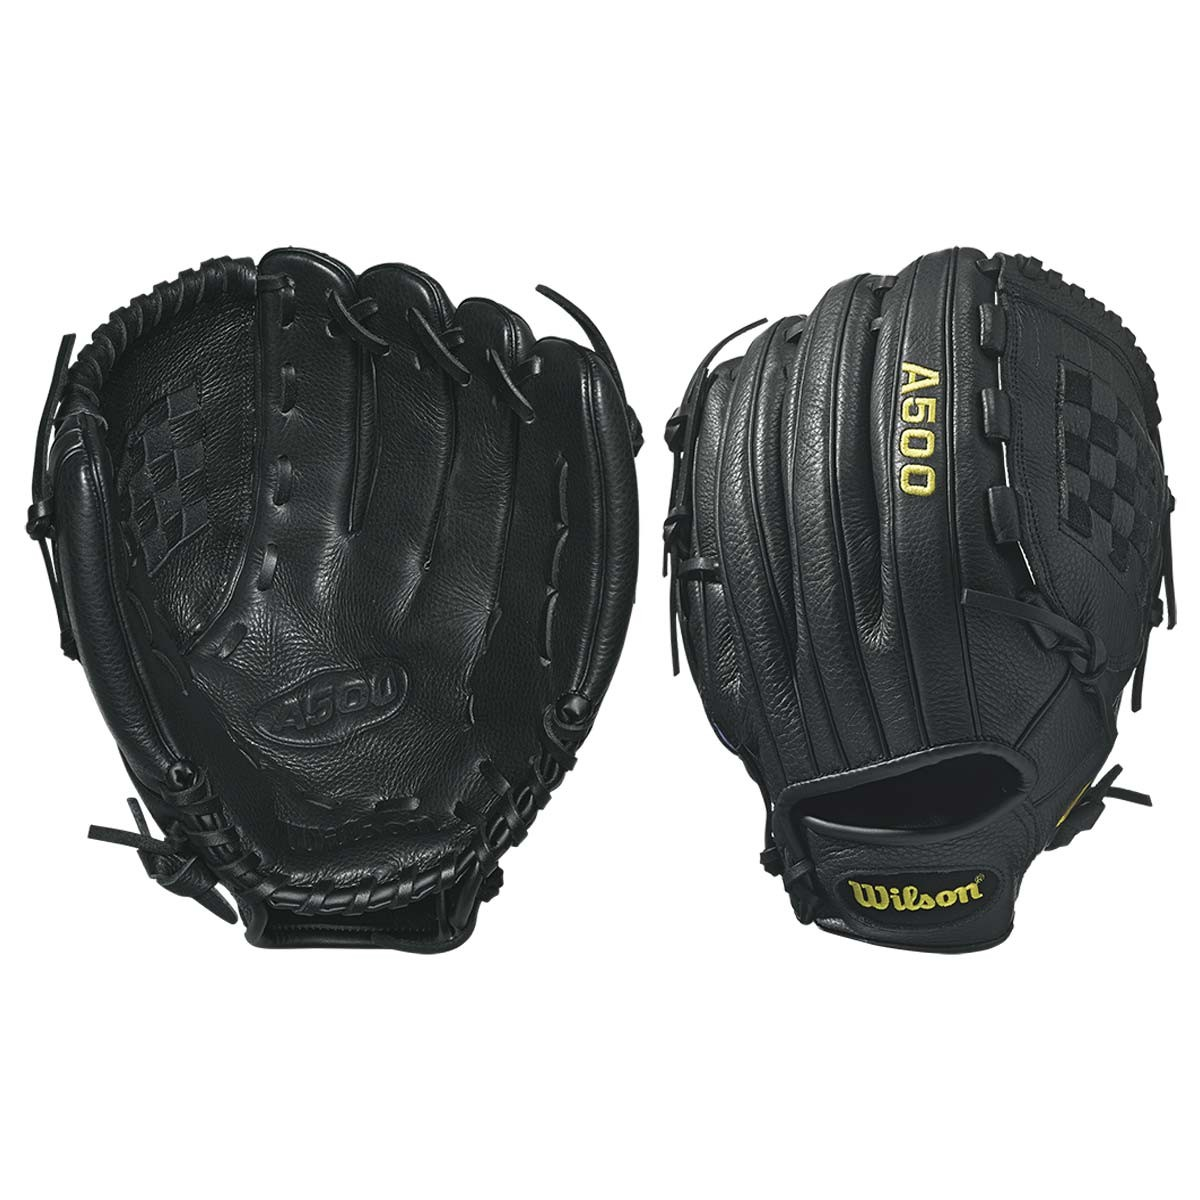 Youth Baseball Glove Leather : Wilson a wta rb youth baseball glove quot